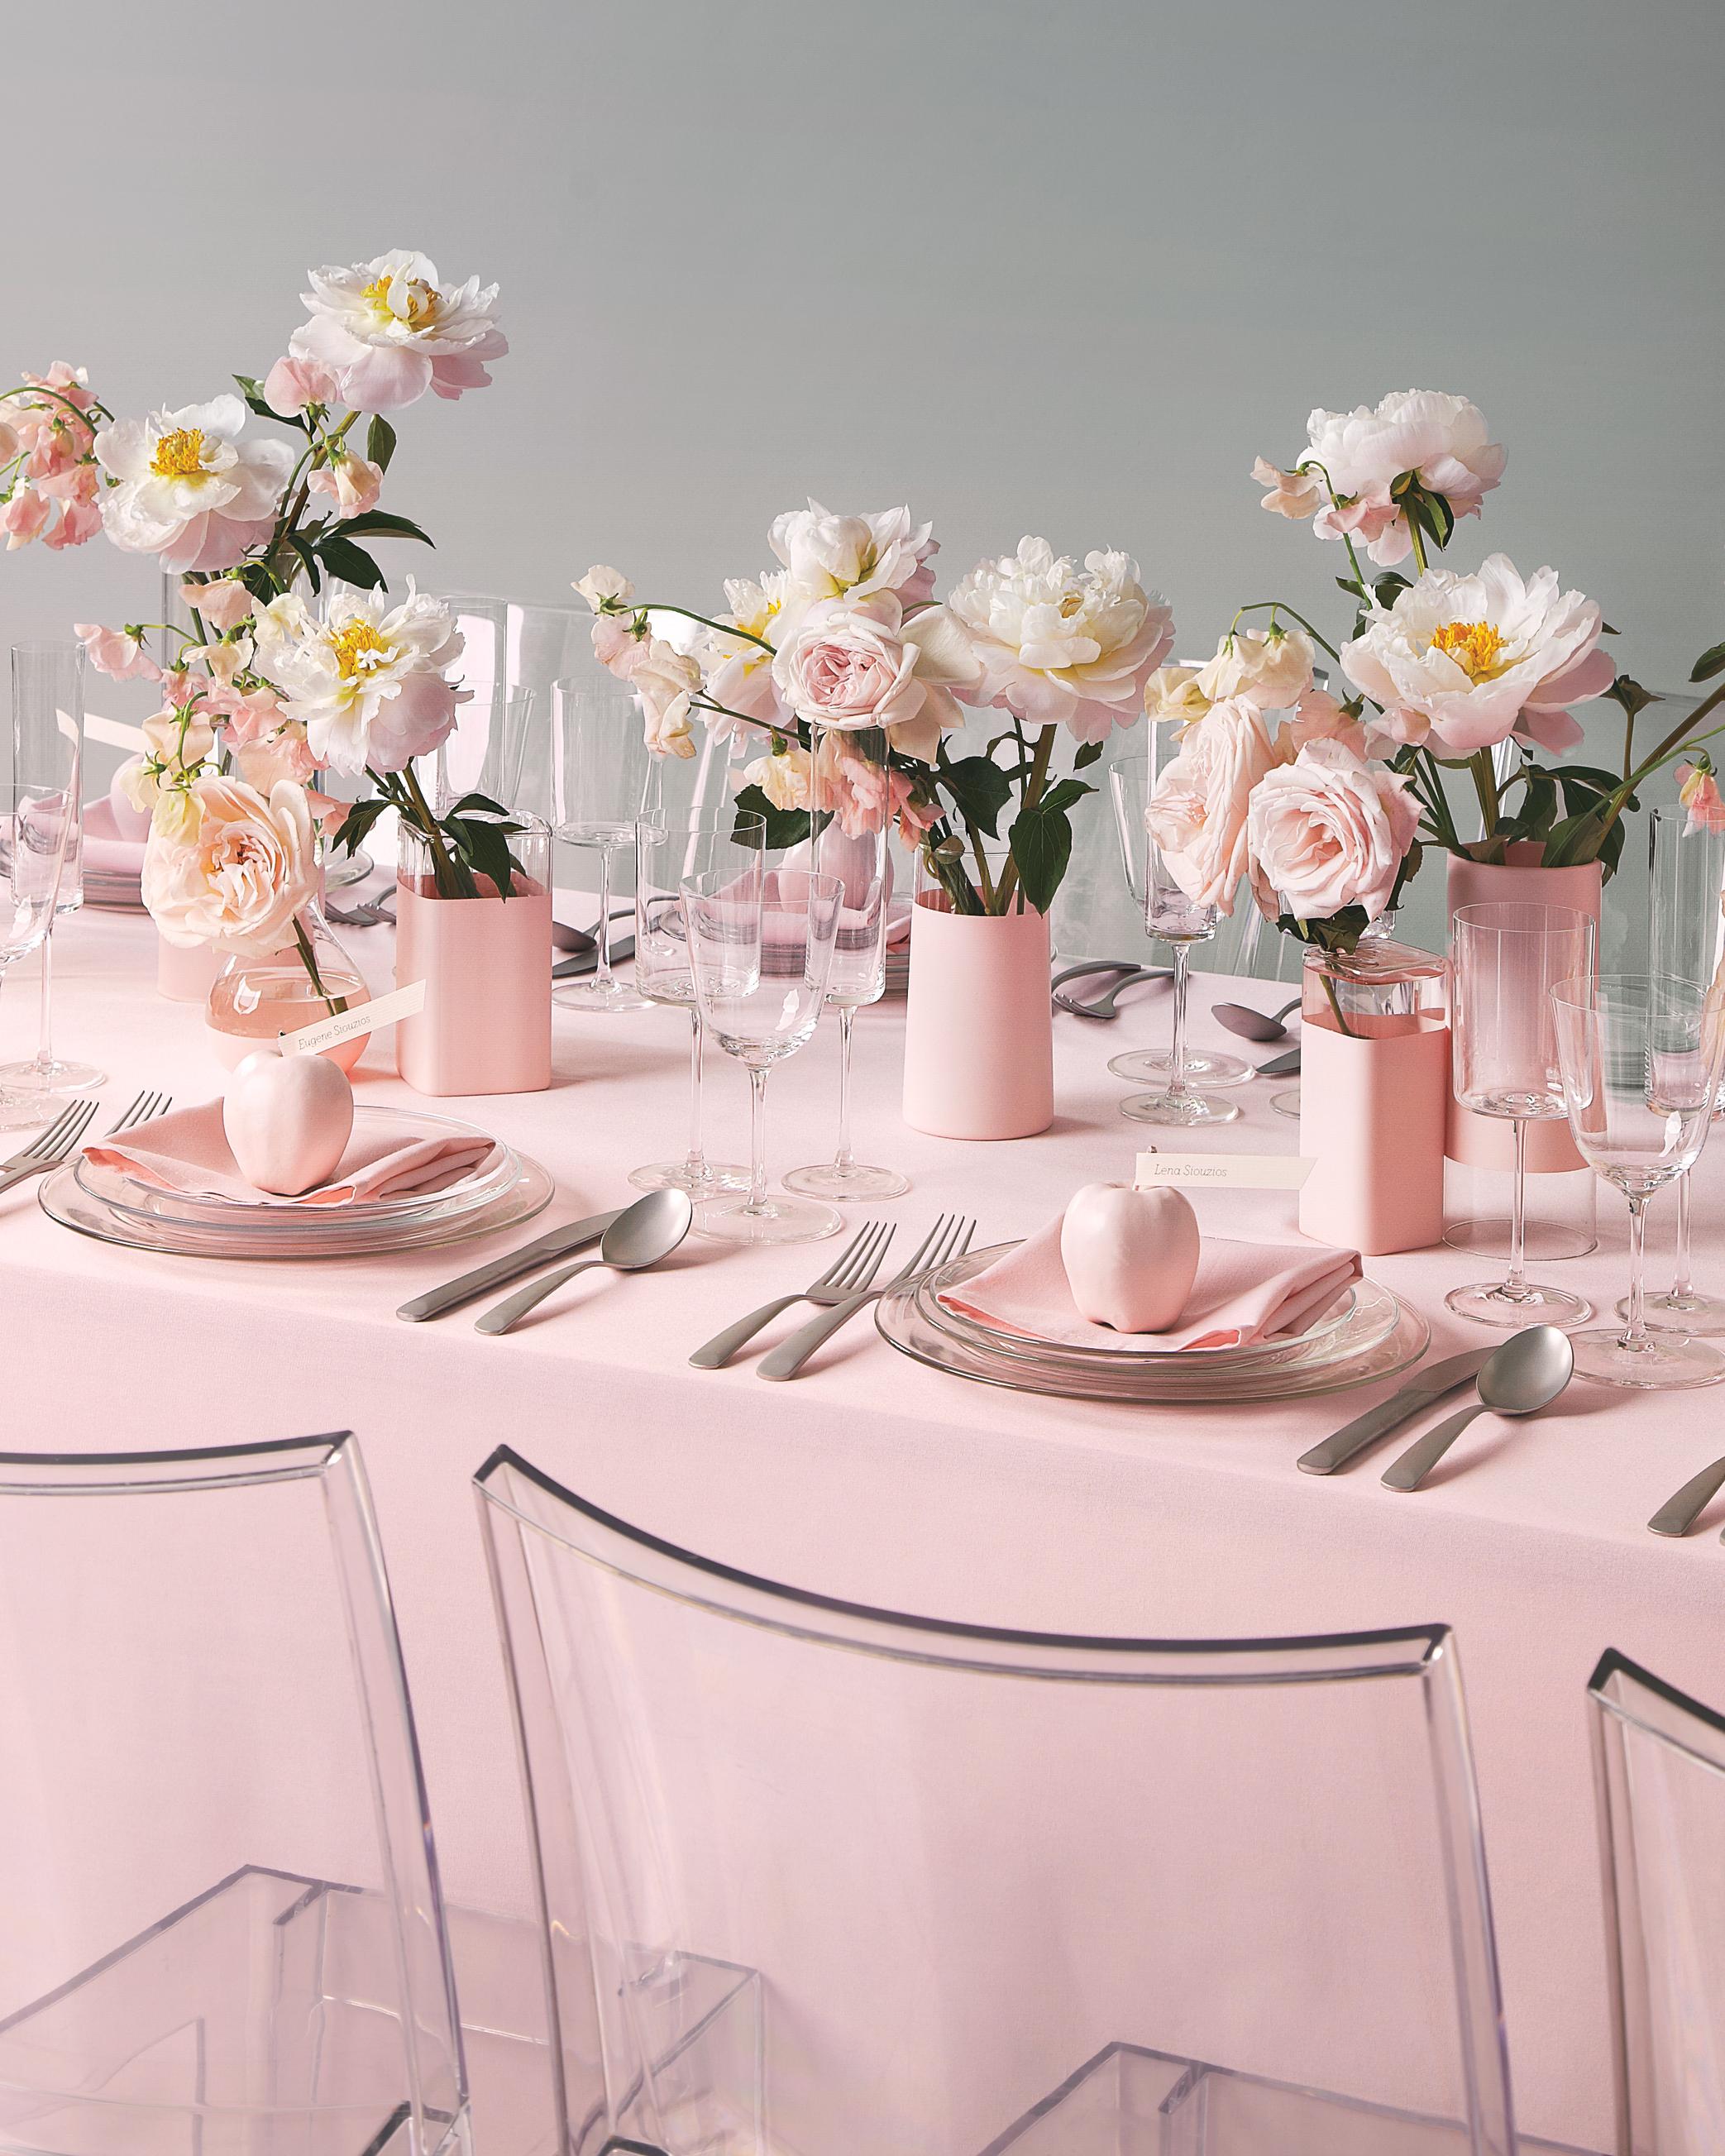 pink-table-setting-479-mwd110197.jpg